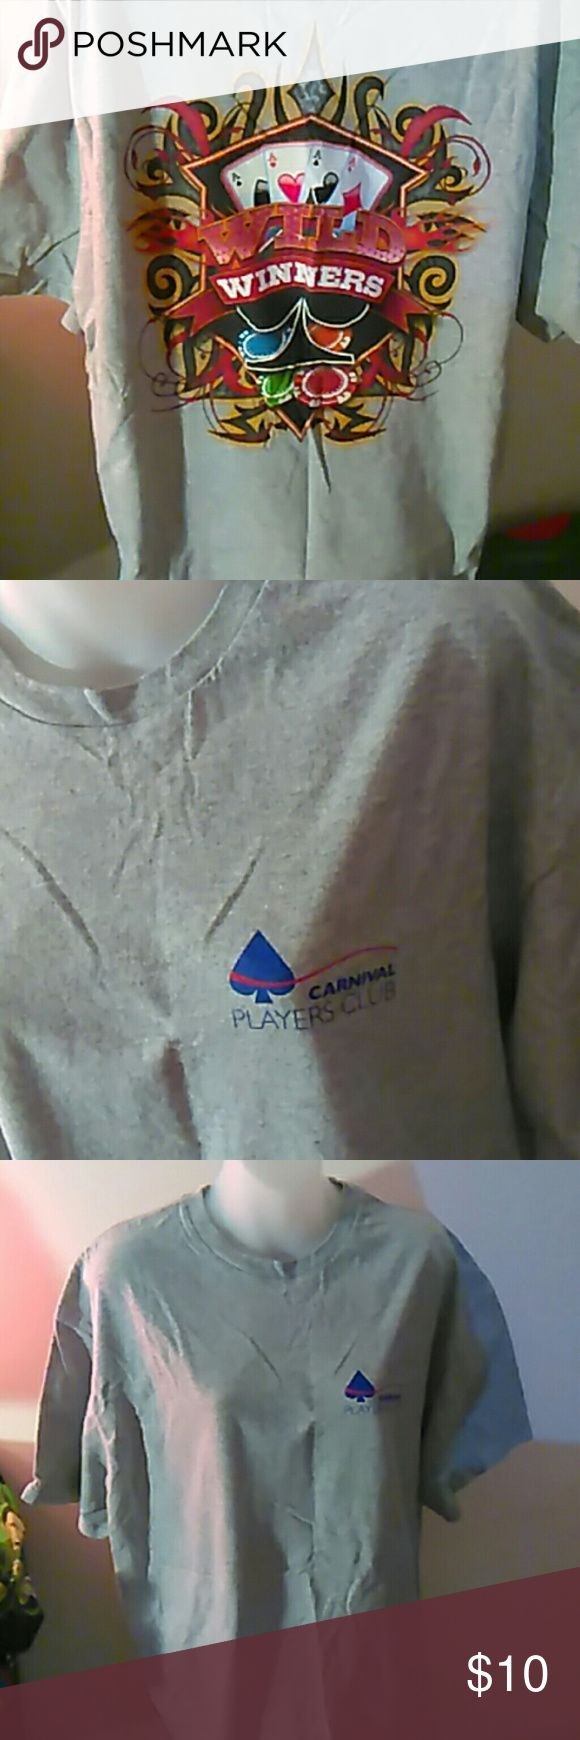 Carnival Players Club tee, mens xl XL men's tee Delta Pro Weight Shirts Tees - Short Sleeve